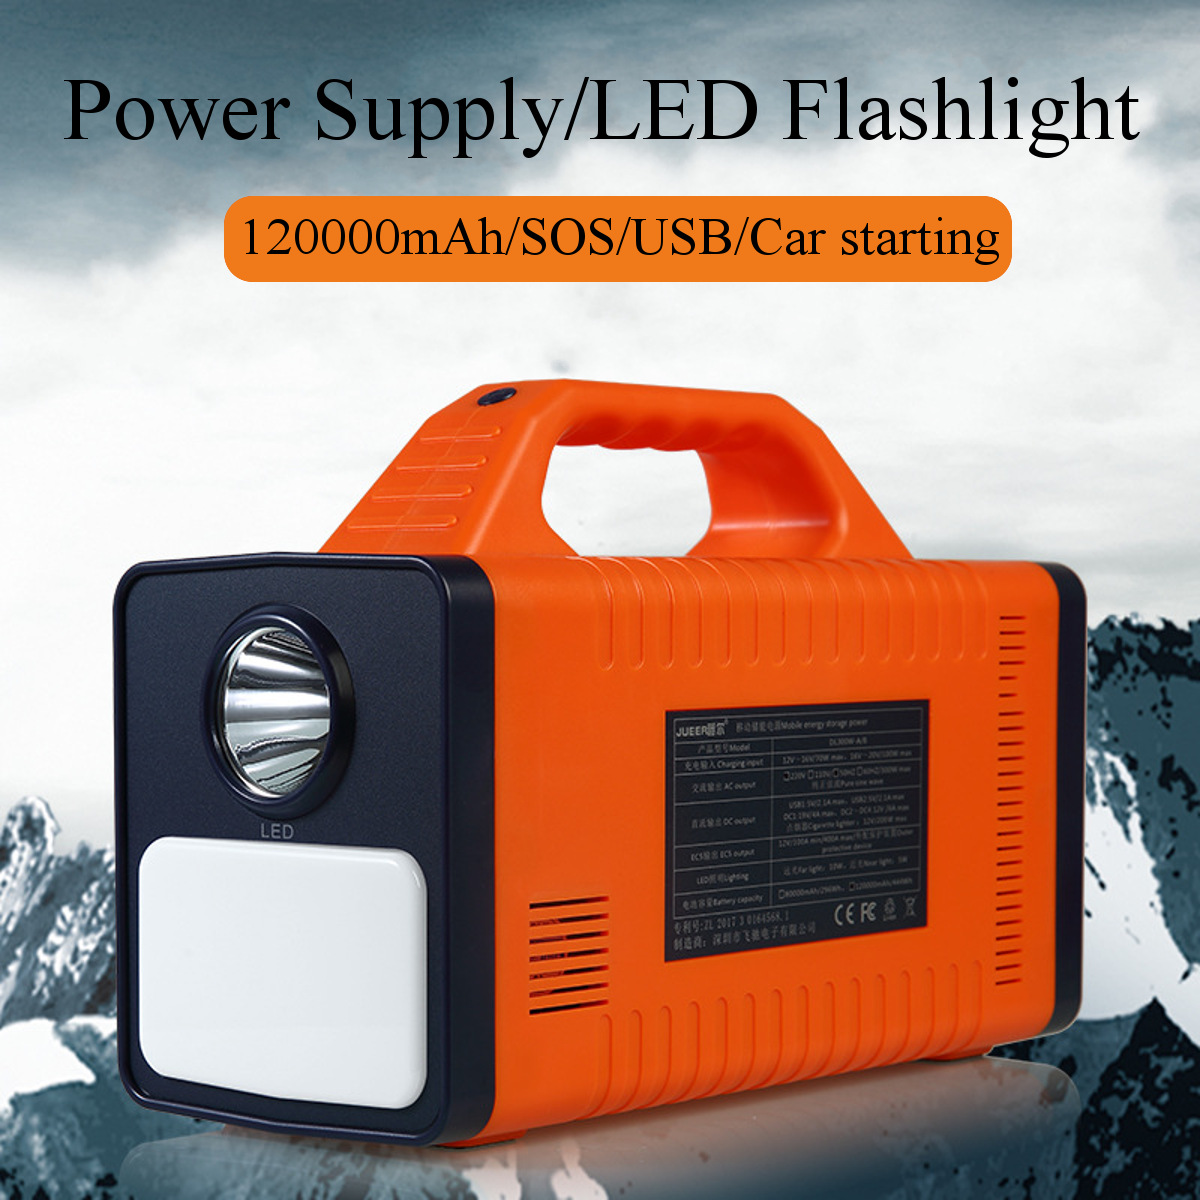 120000mAh 444Wh 300W Portable Solar Power Inverter Generator Camping Light Car Jump Starter Energy Storage Mobile Power Supply